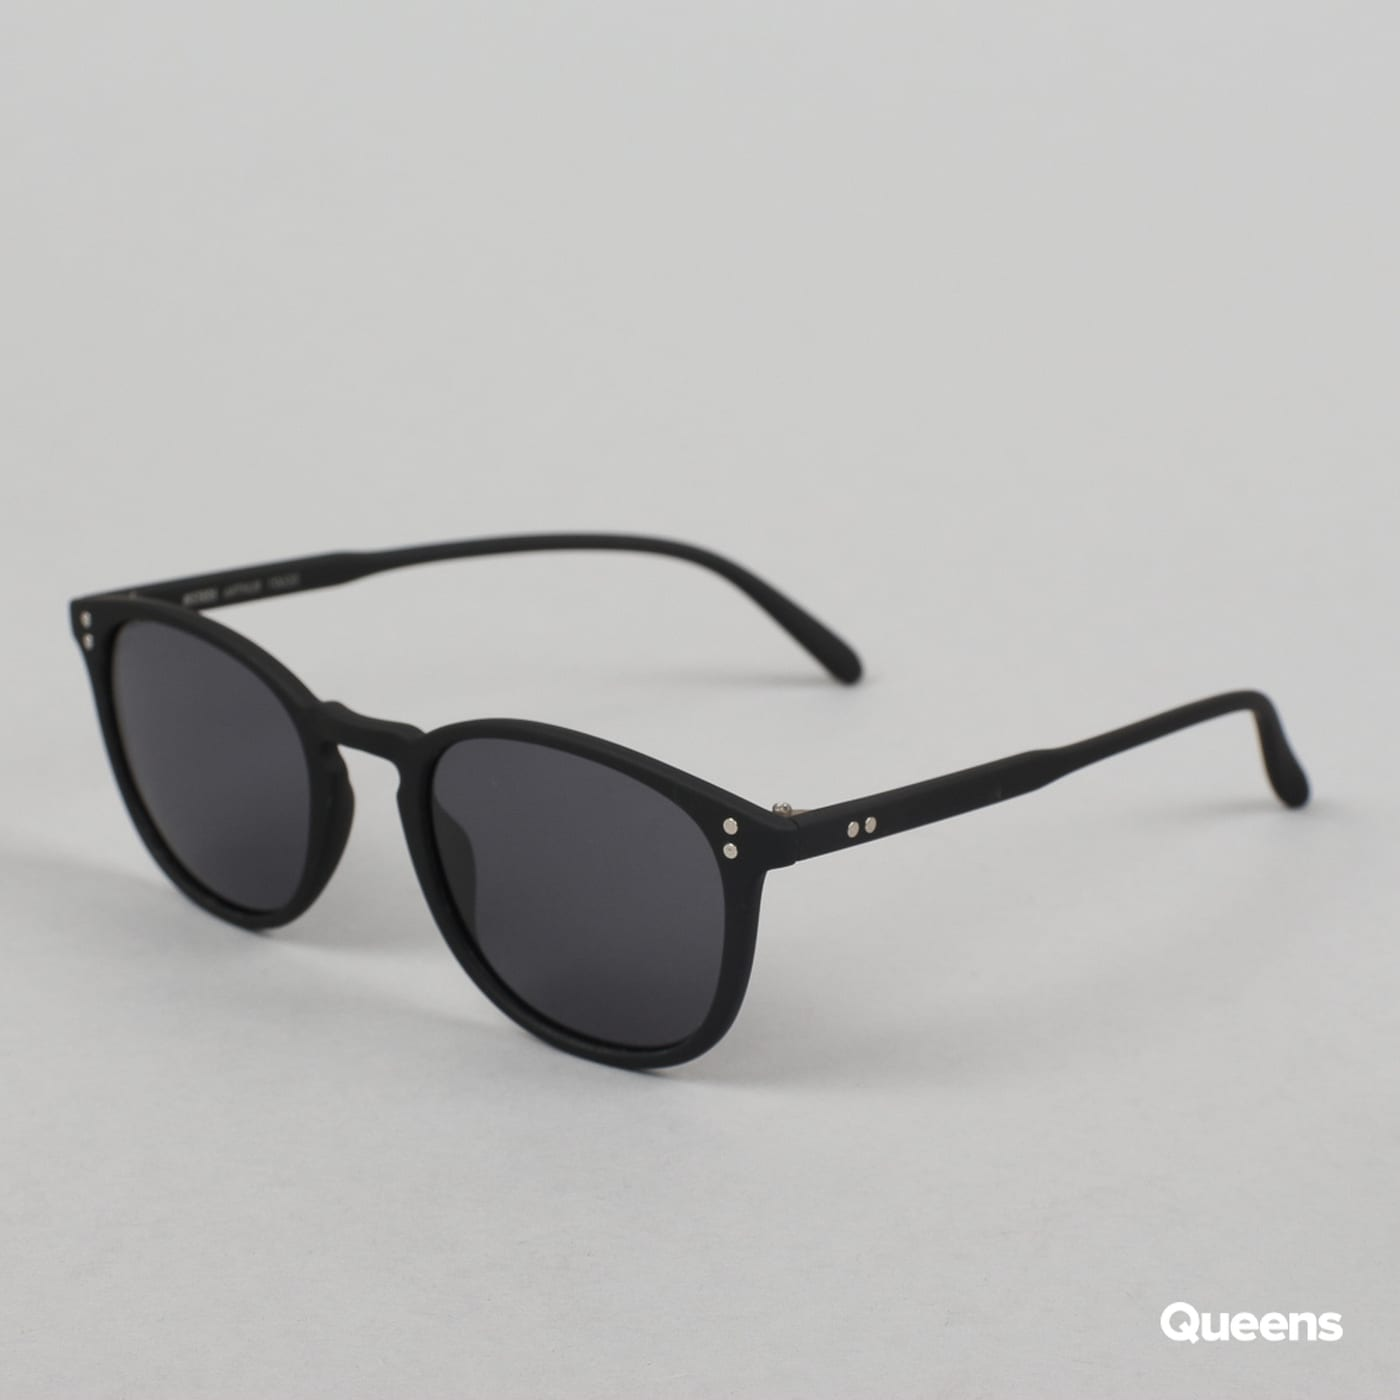 MD Sunglasses Arthur čierne / šedé